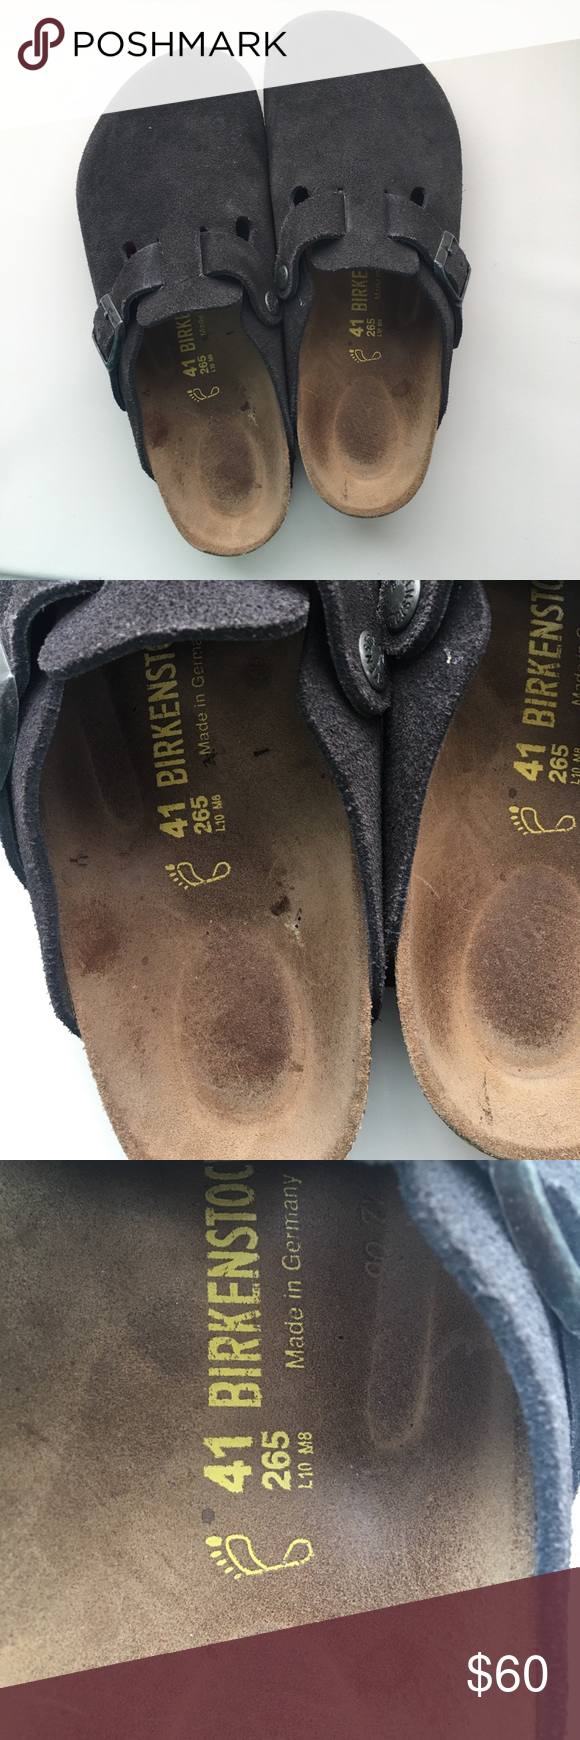 new style 22104 1d0d6 Birkenstock Betula 41 265 Dark Gray Suede Mules Birkenstock ...